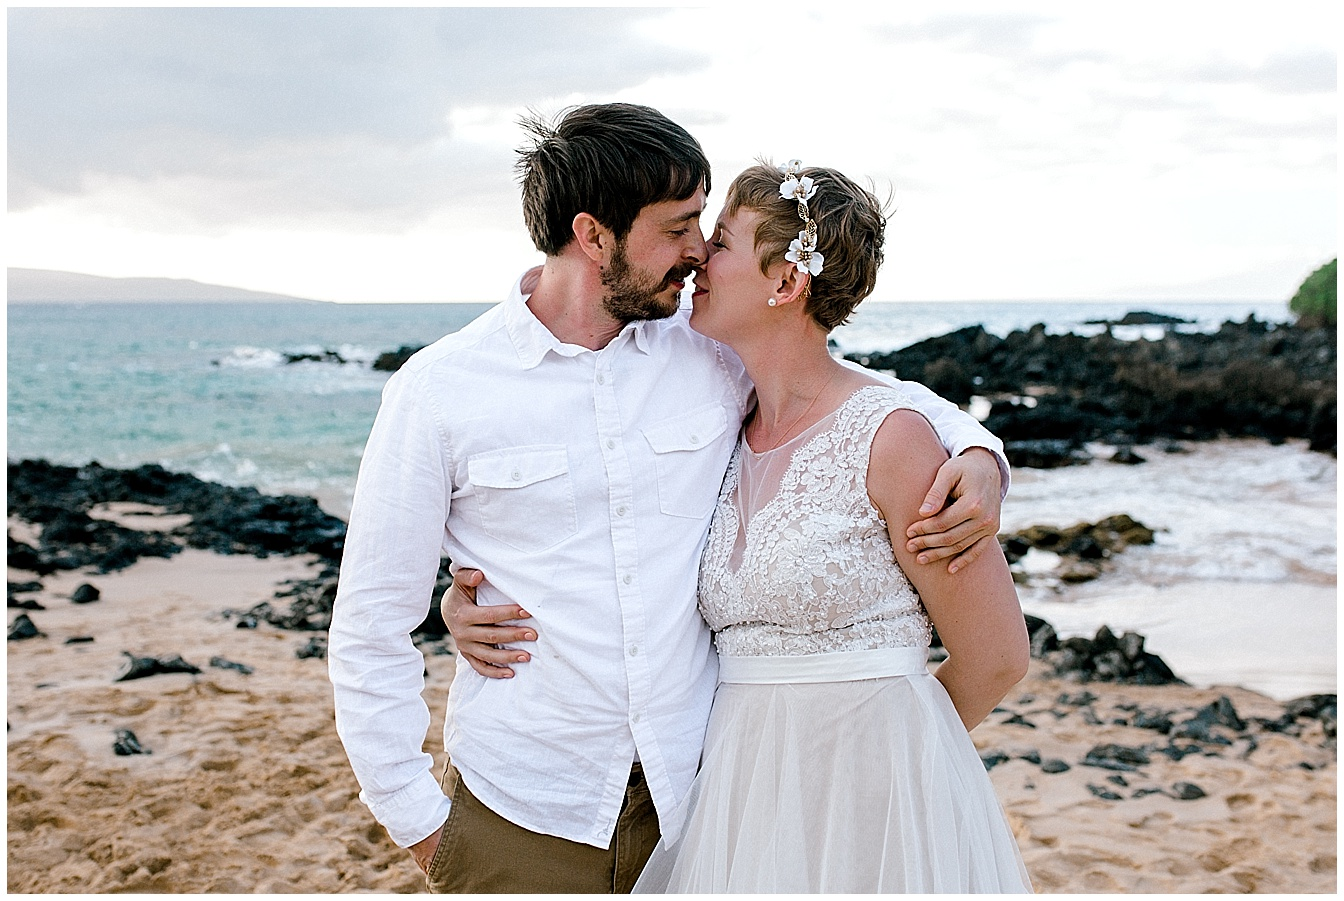 Bride and groom embracing on Maui beach